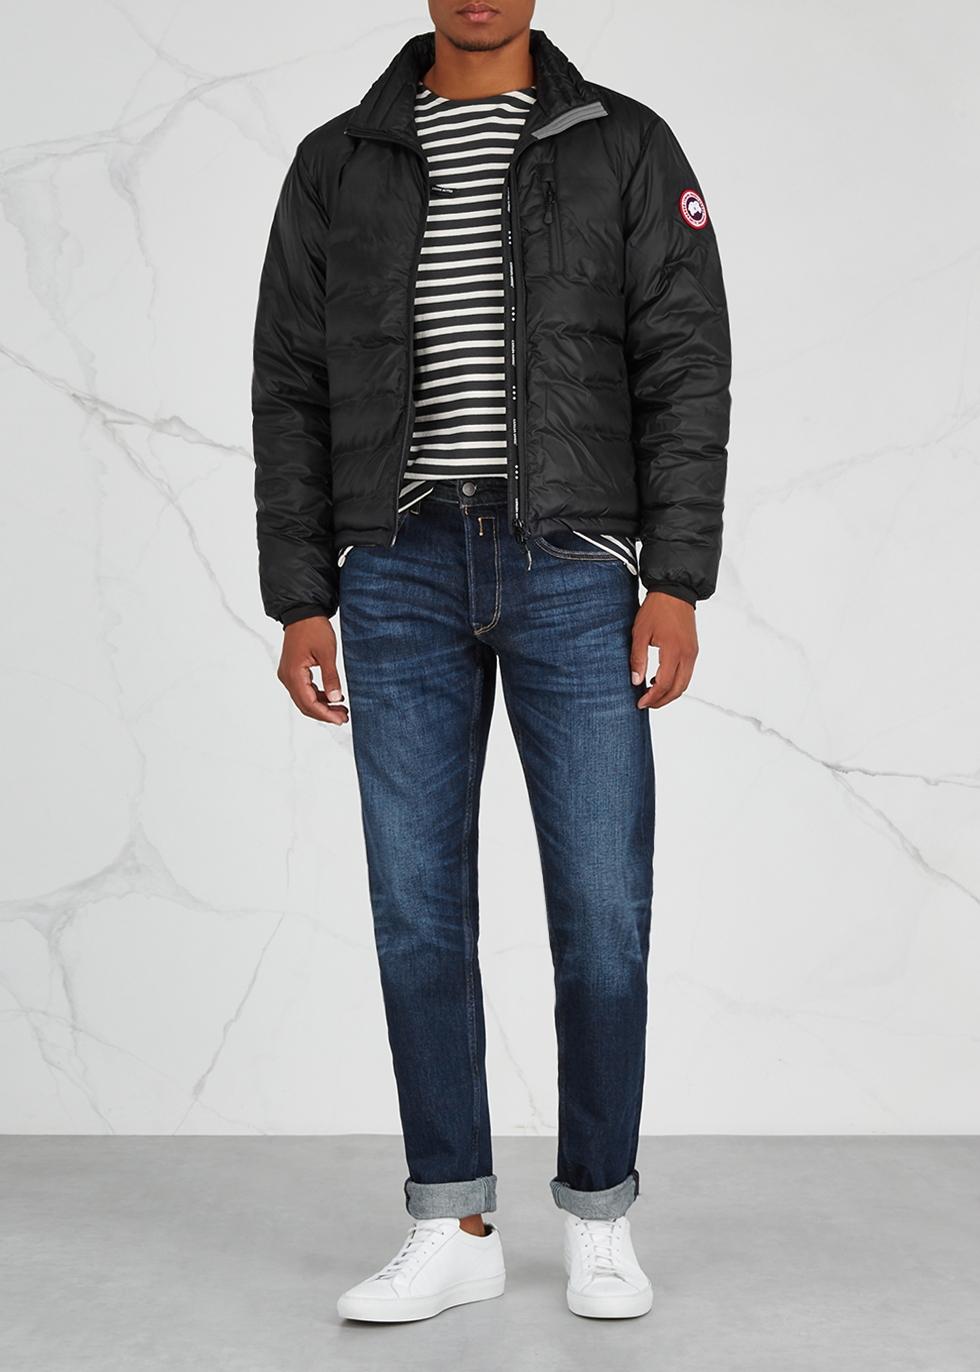 canada goose lodge jacket herr